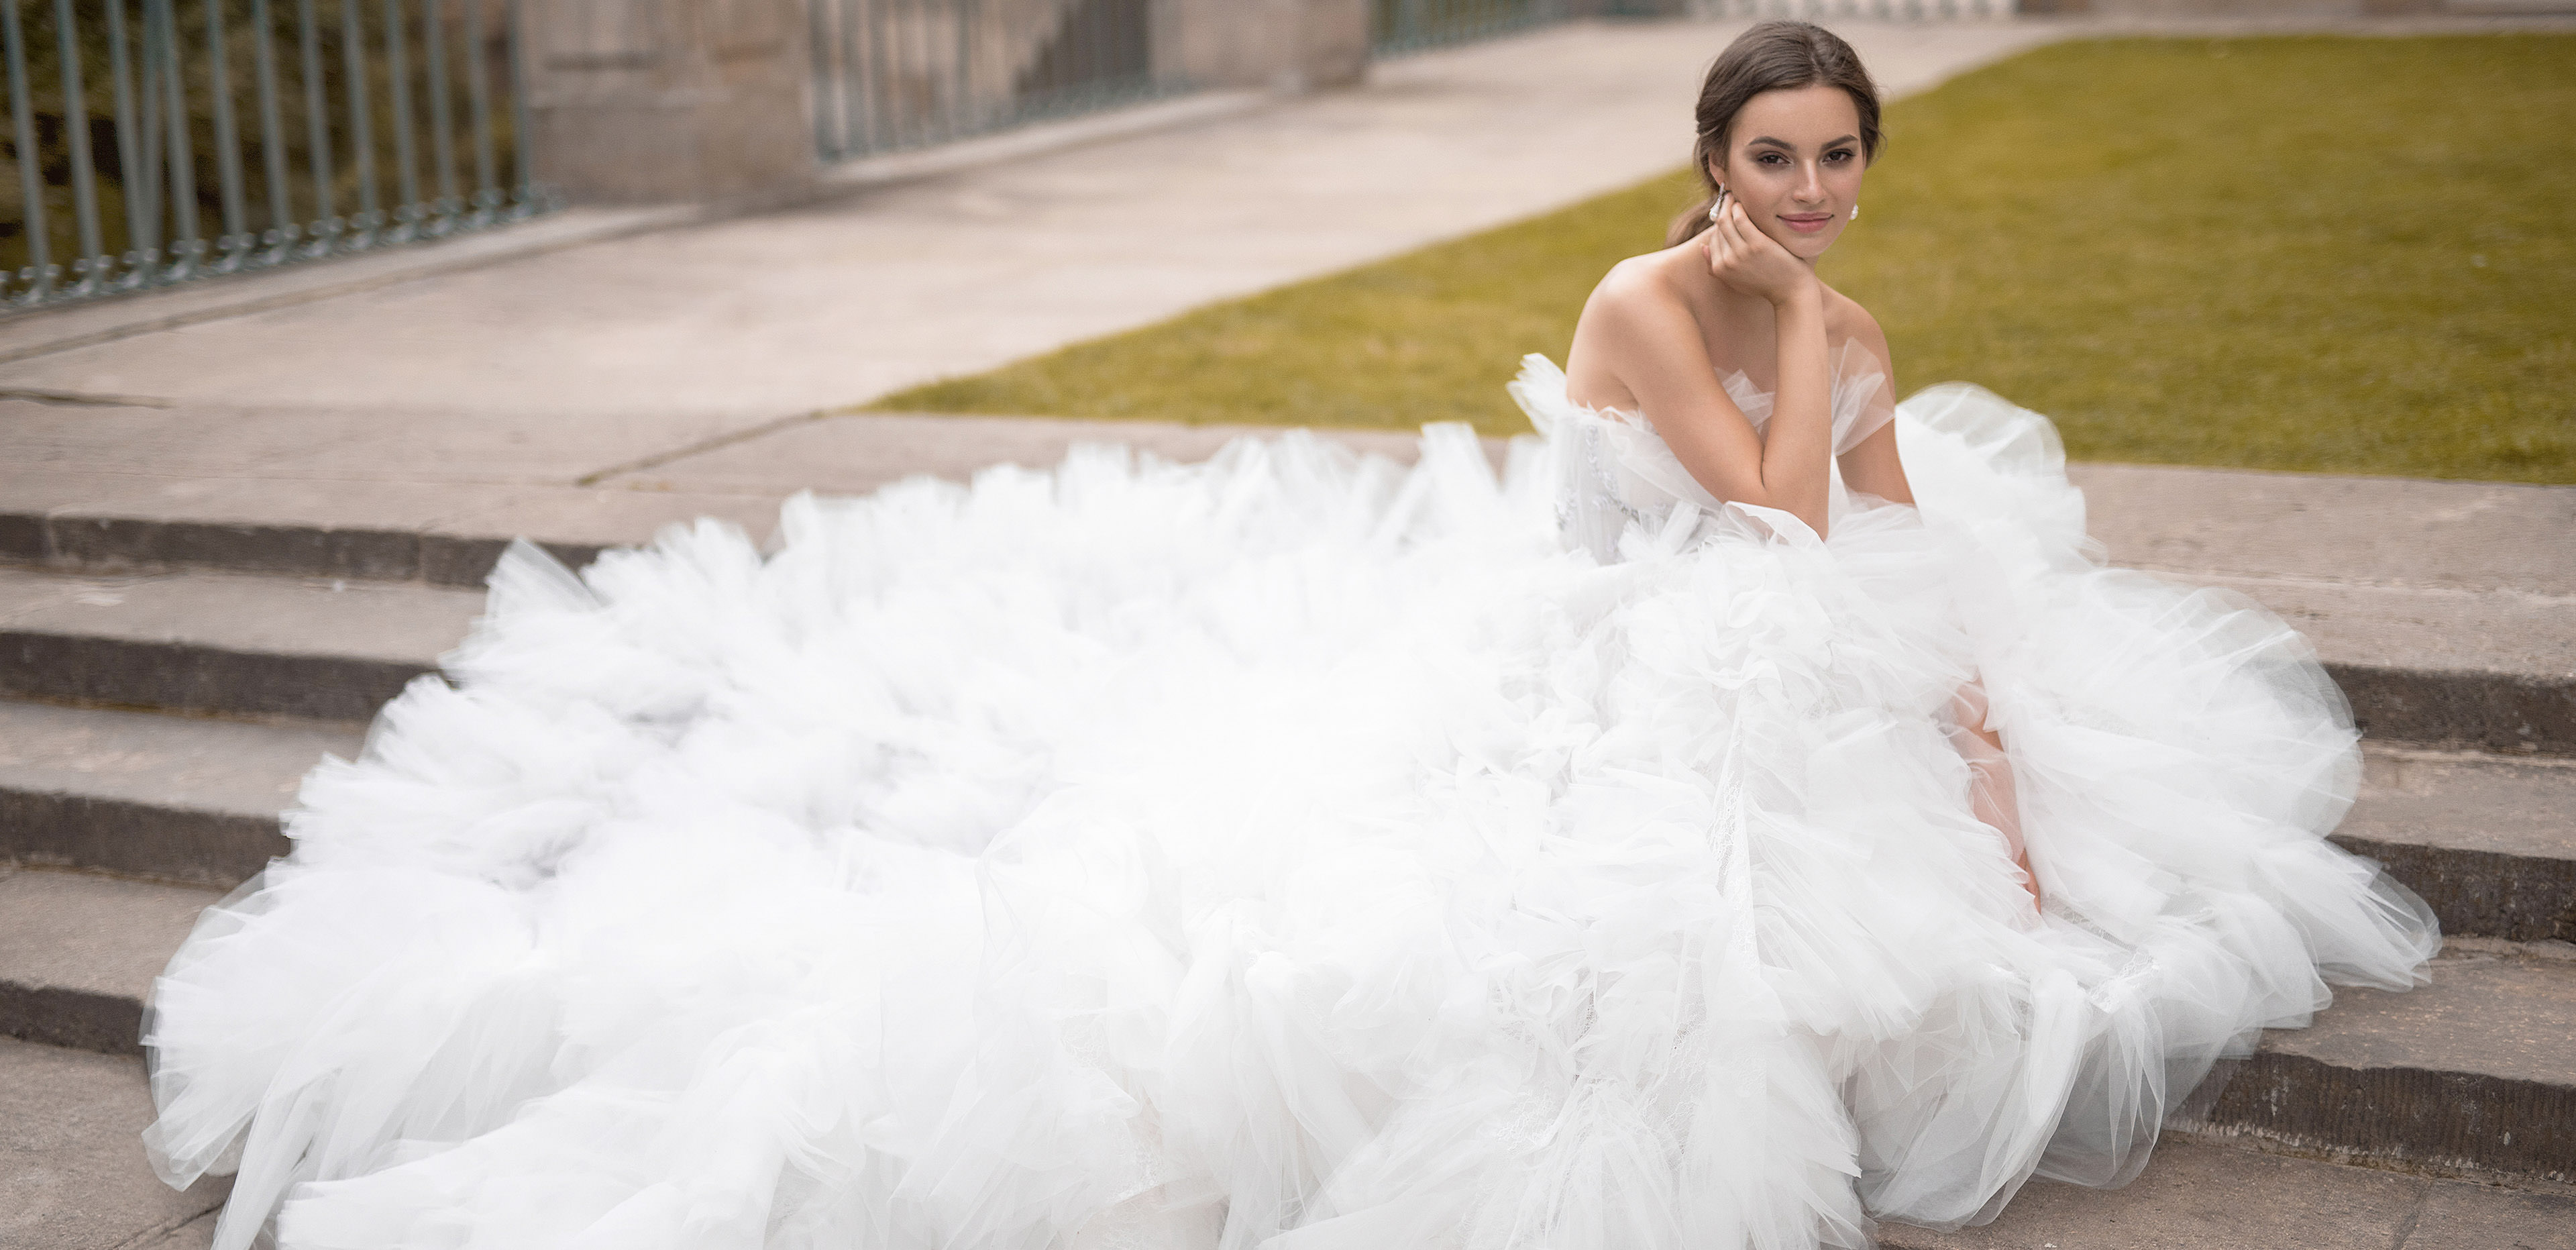 Blammo-Biamo wedding dresses | Wedding Dresses Online Store